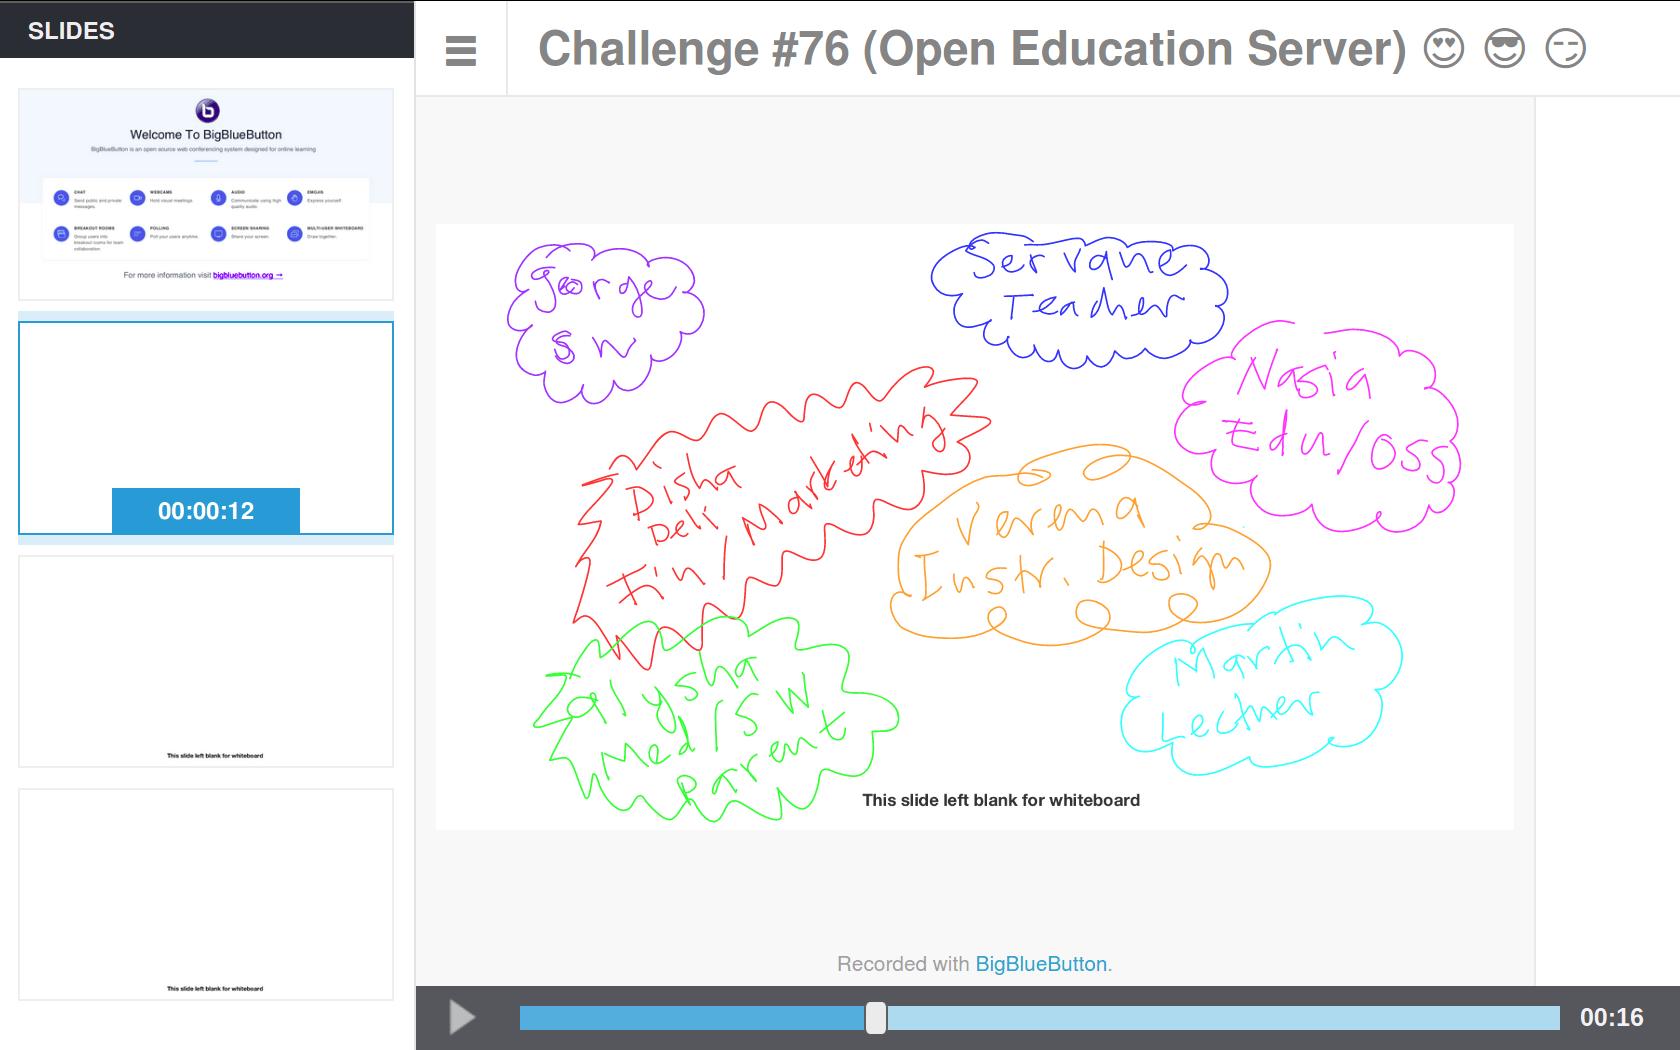 Challenge #76 (Open Education Server)